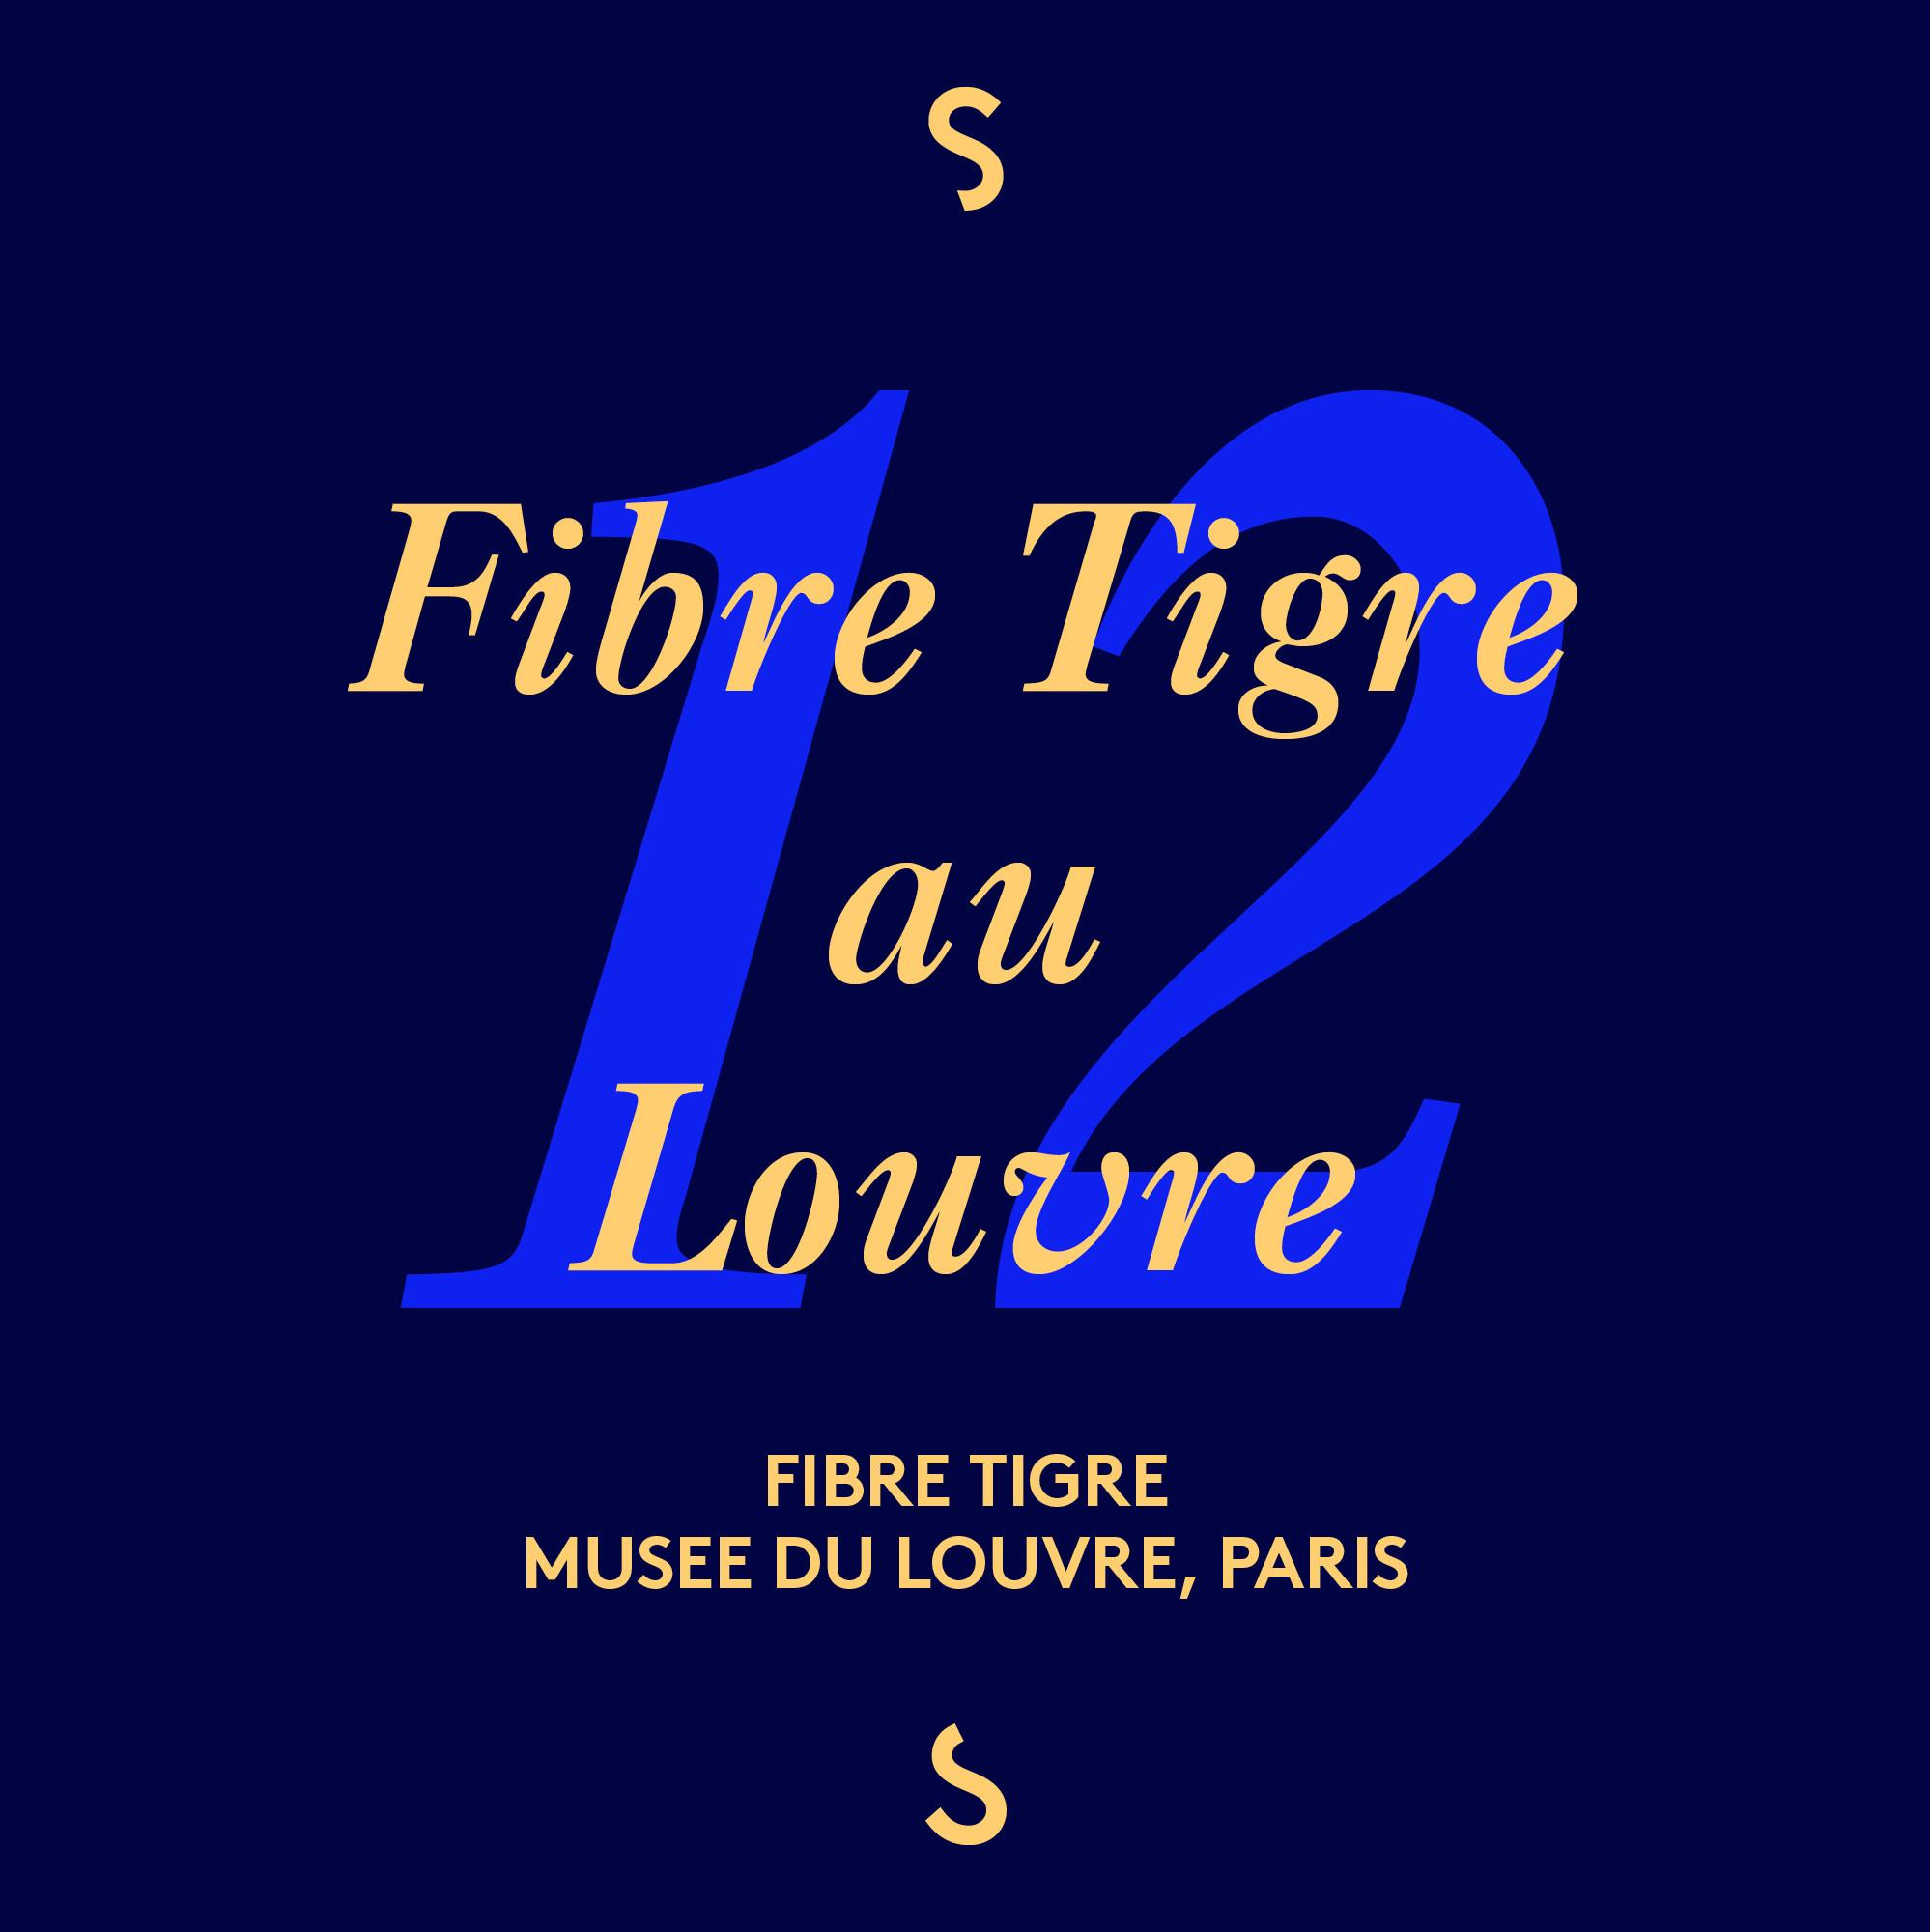 Fibre Tigre au Louvre